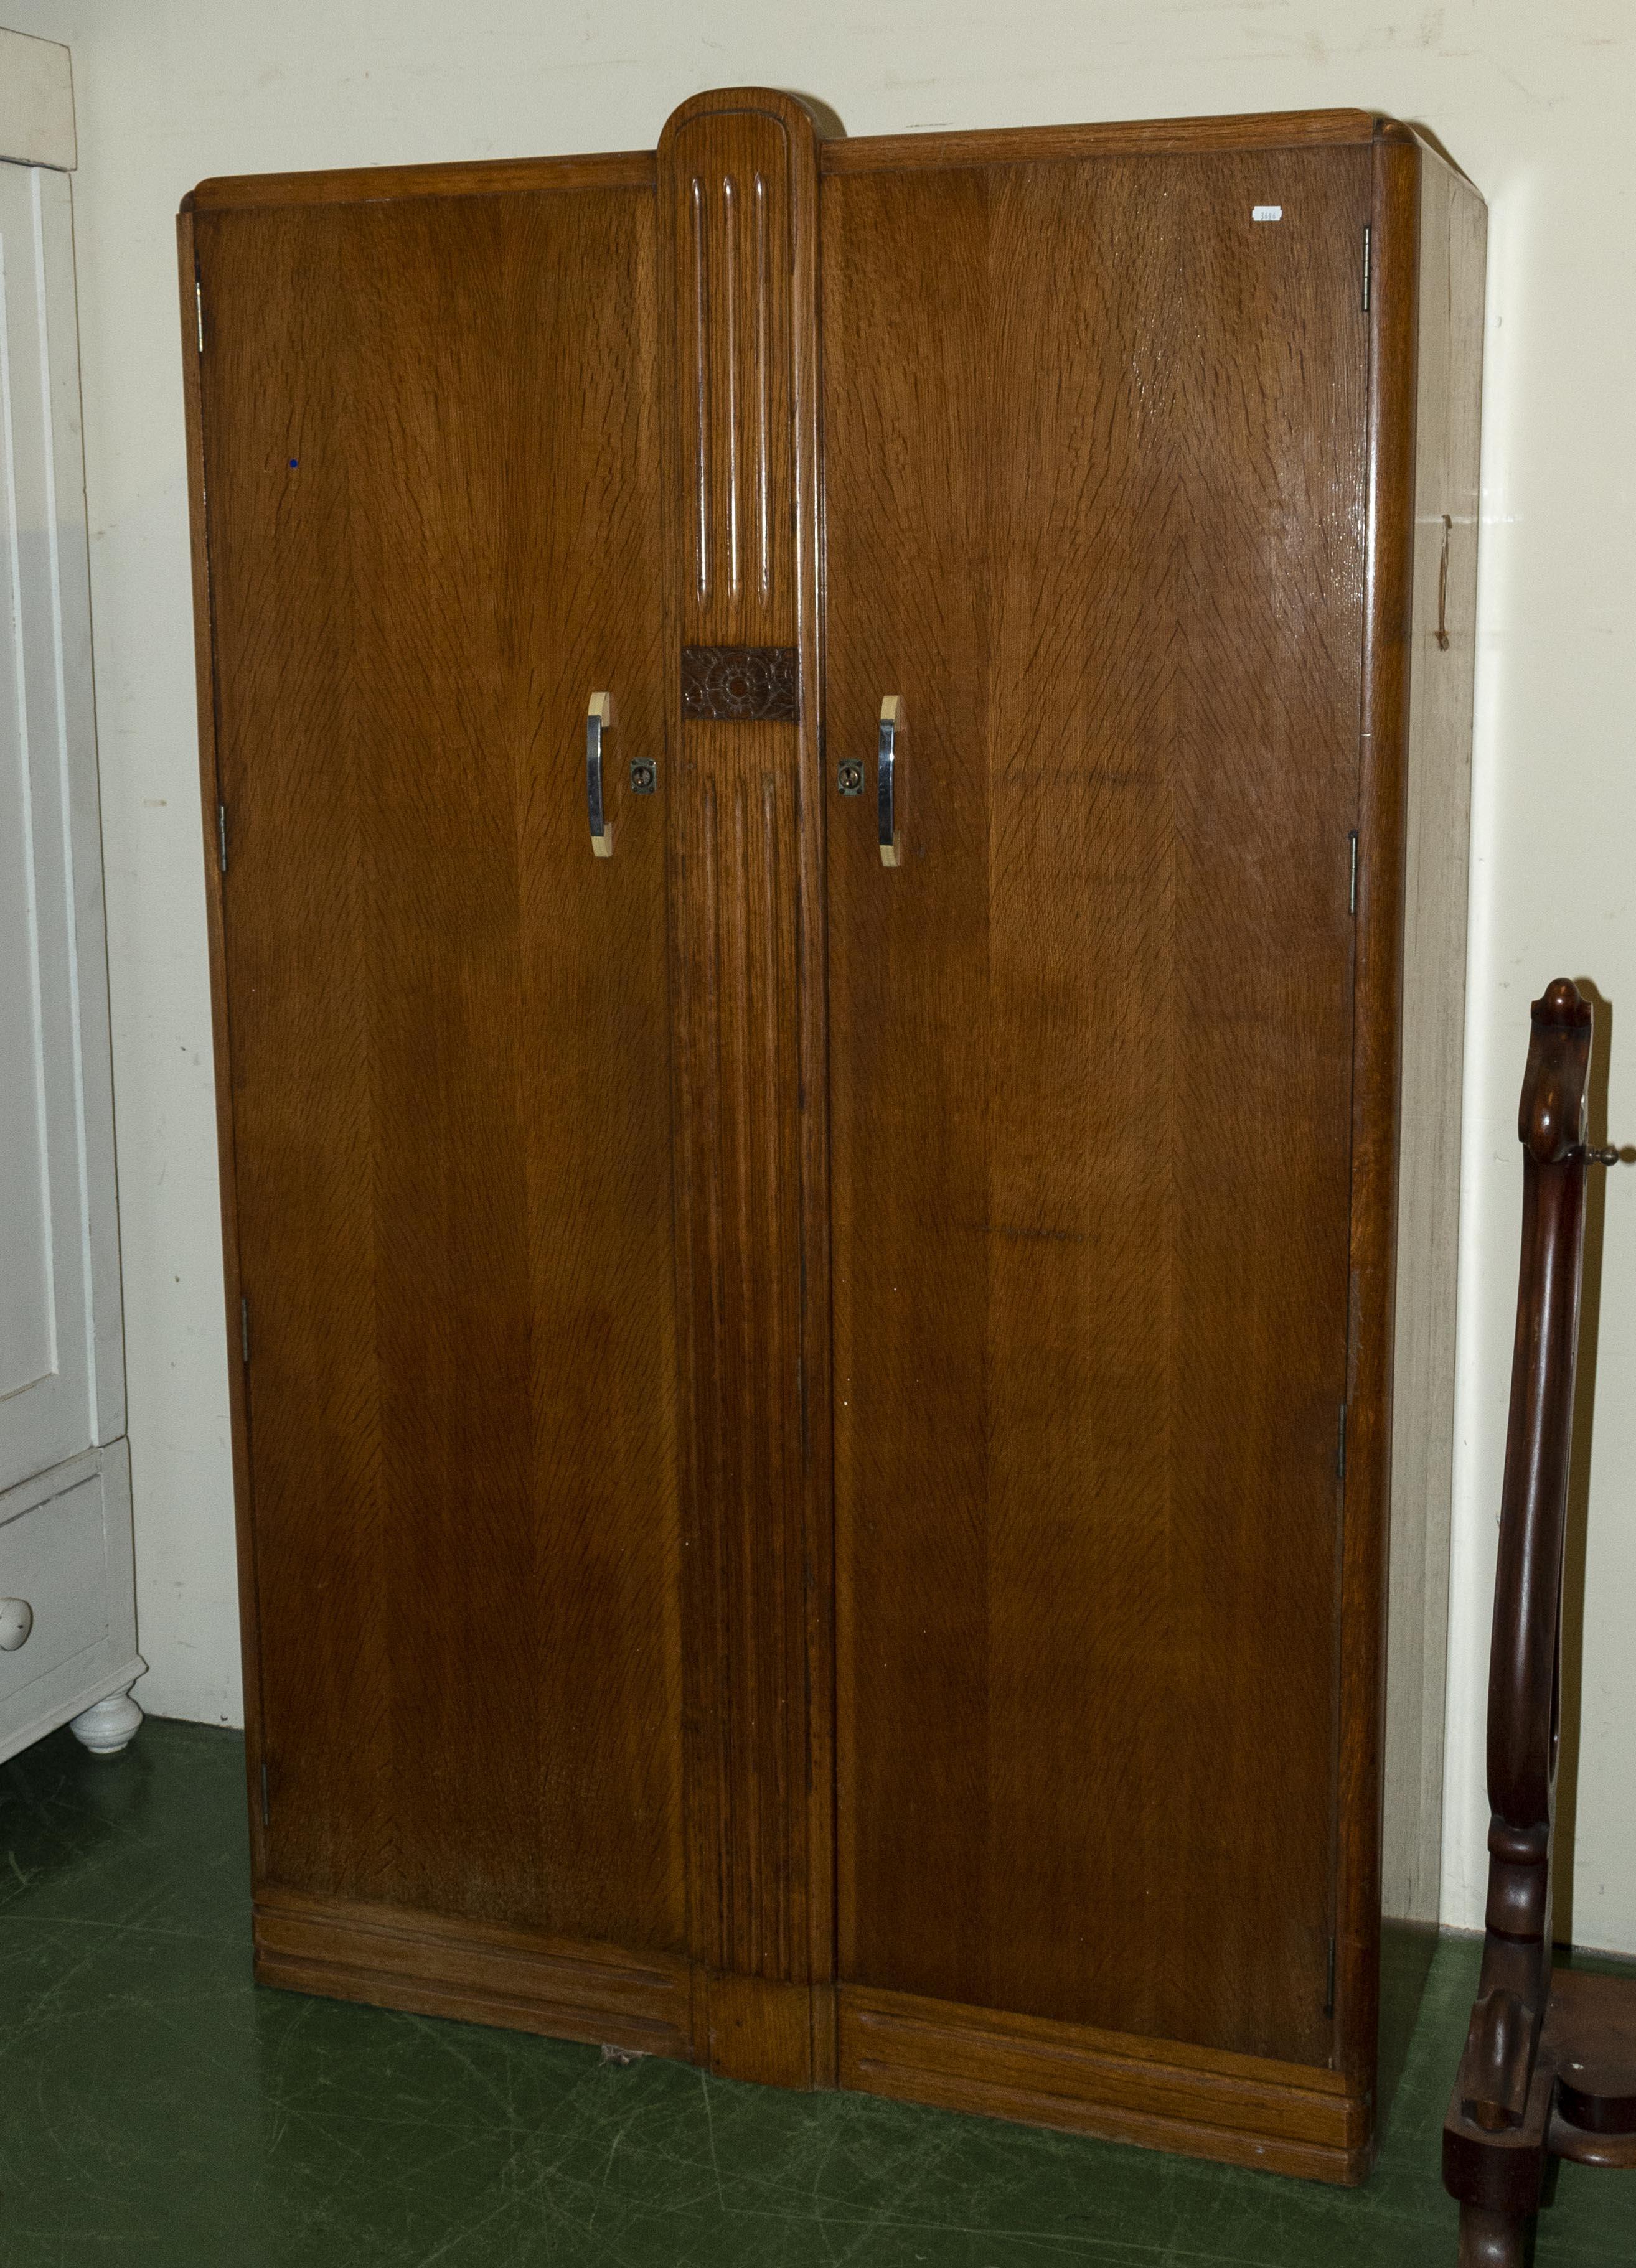 Lot 9 - An oak Deco wardrobe (matching lot 10)